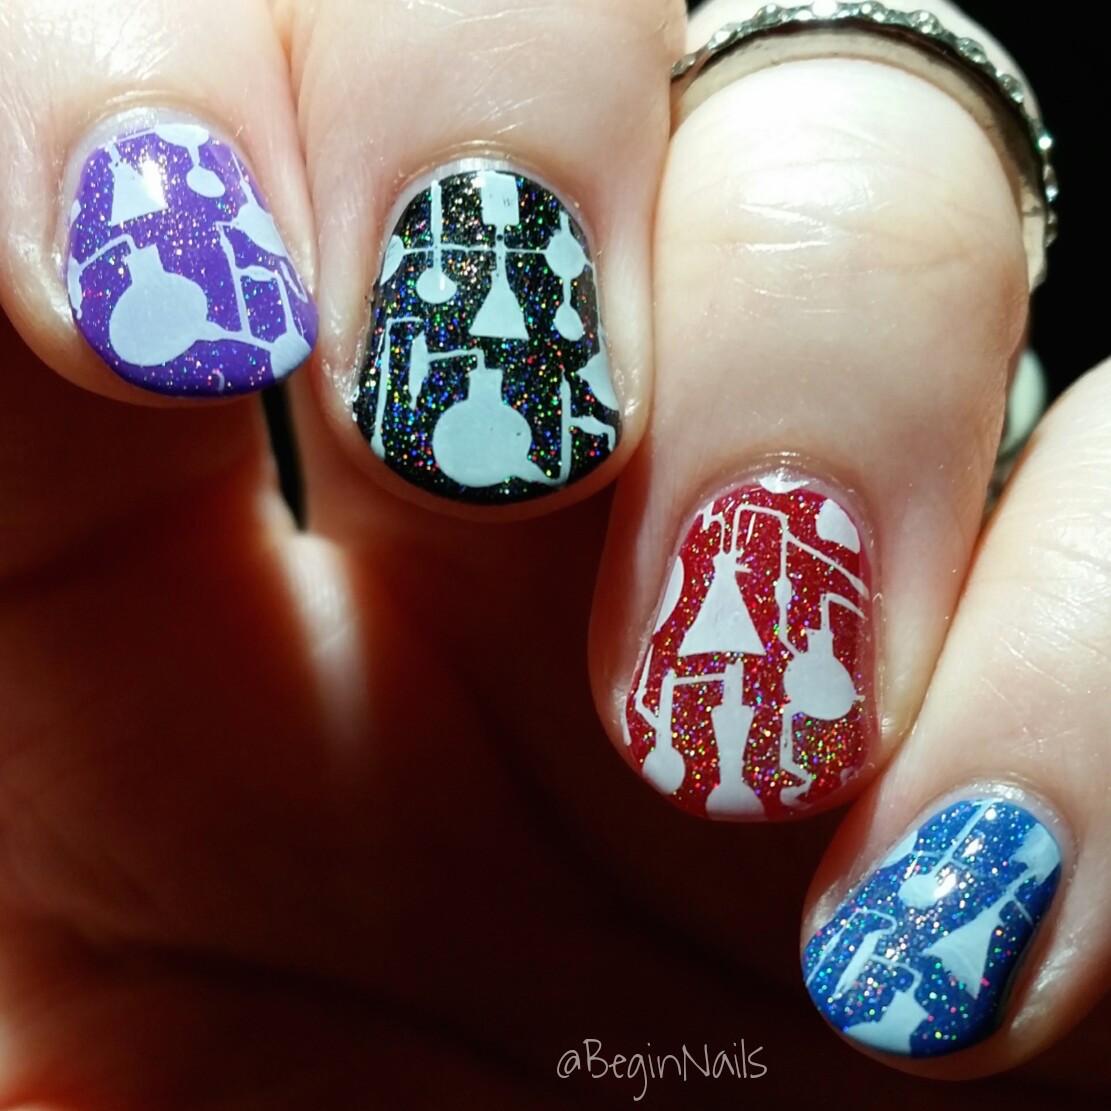 Let S Talk Nail Art: Let's Begin Nails: It Girl Nail Art IG110 Plate Manis Part 1